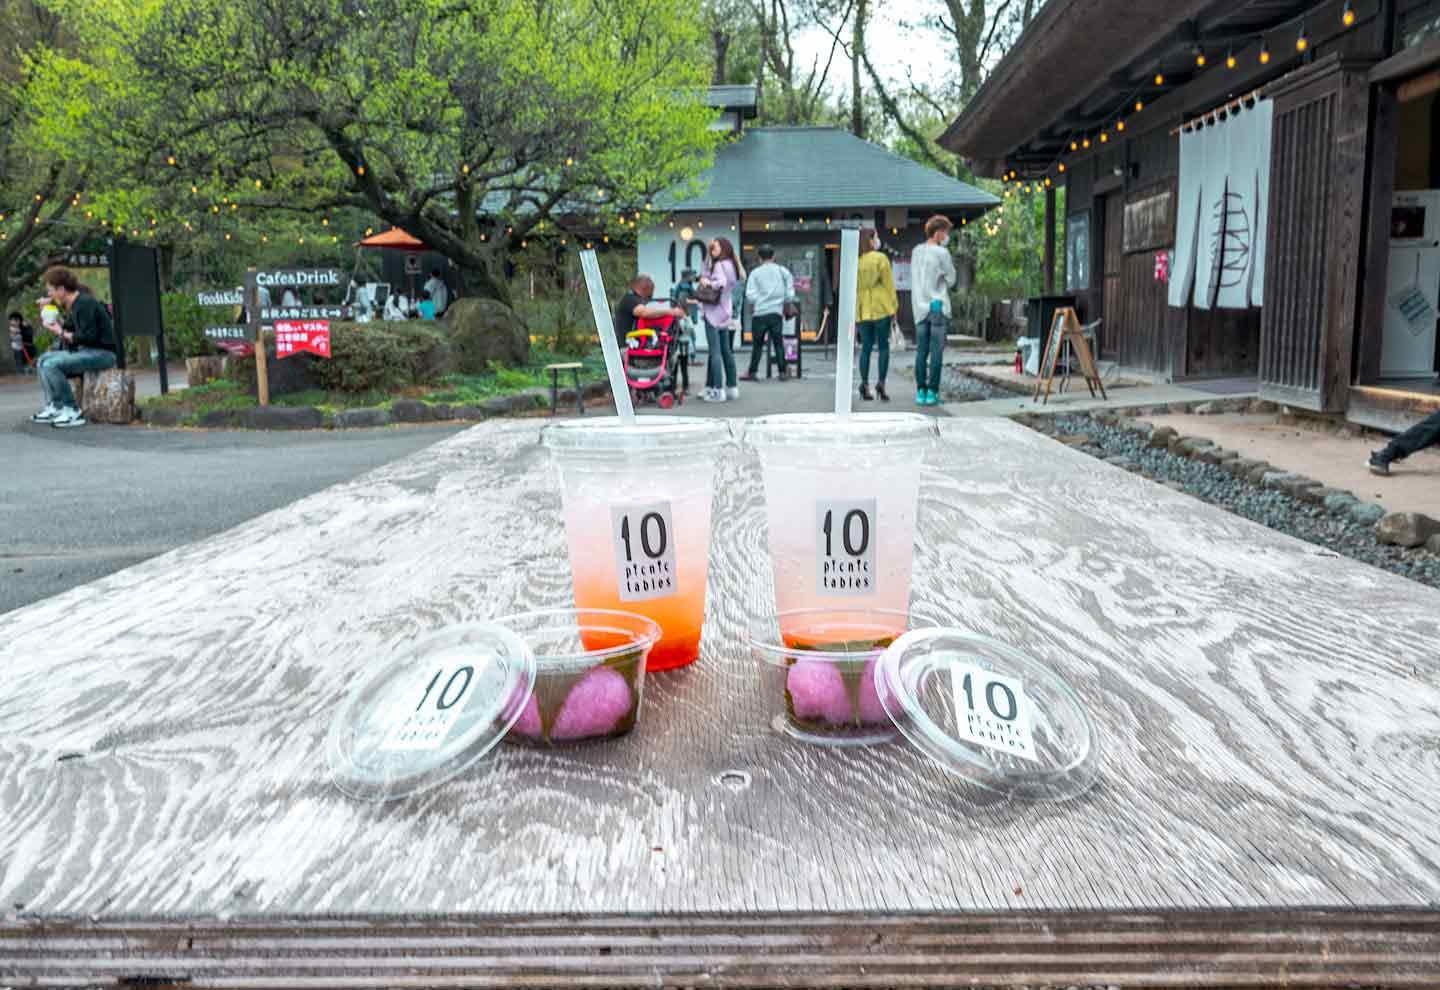 『10 picnic tables』 ドリンク スイーツ